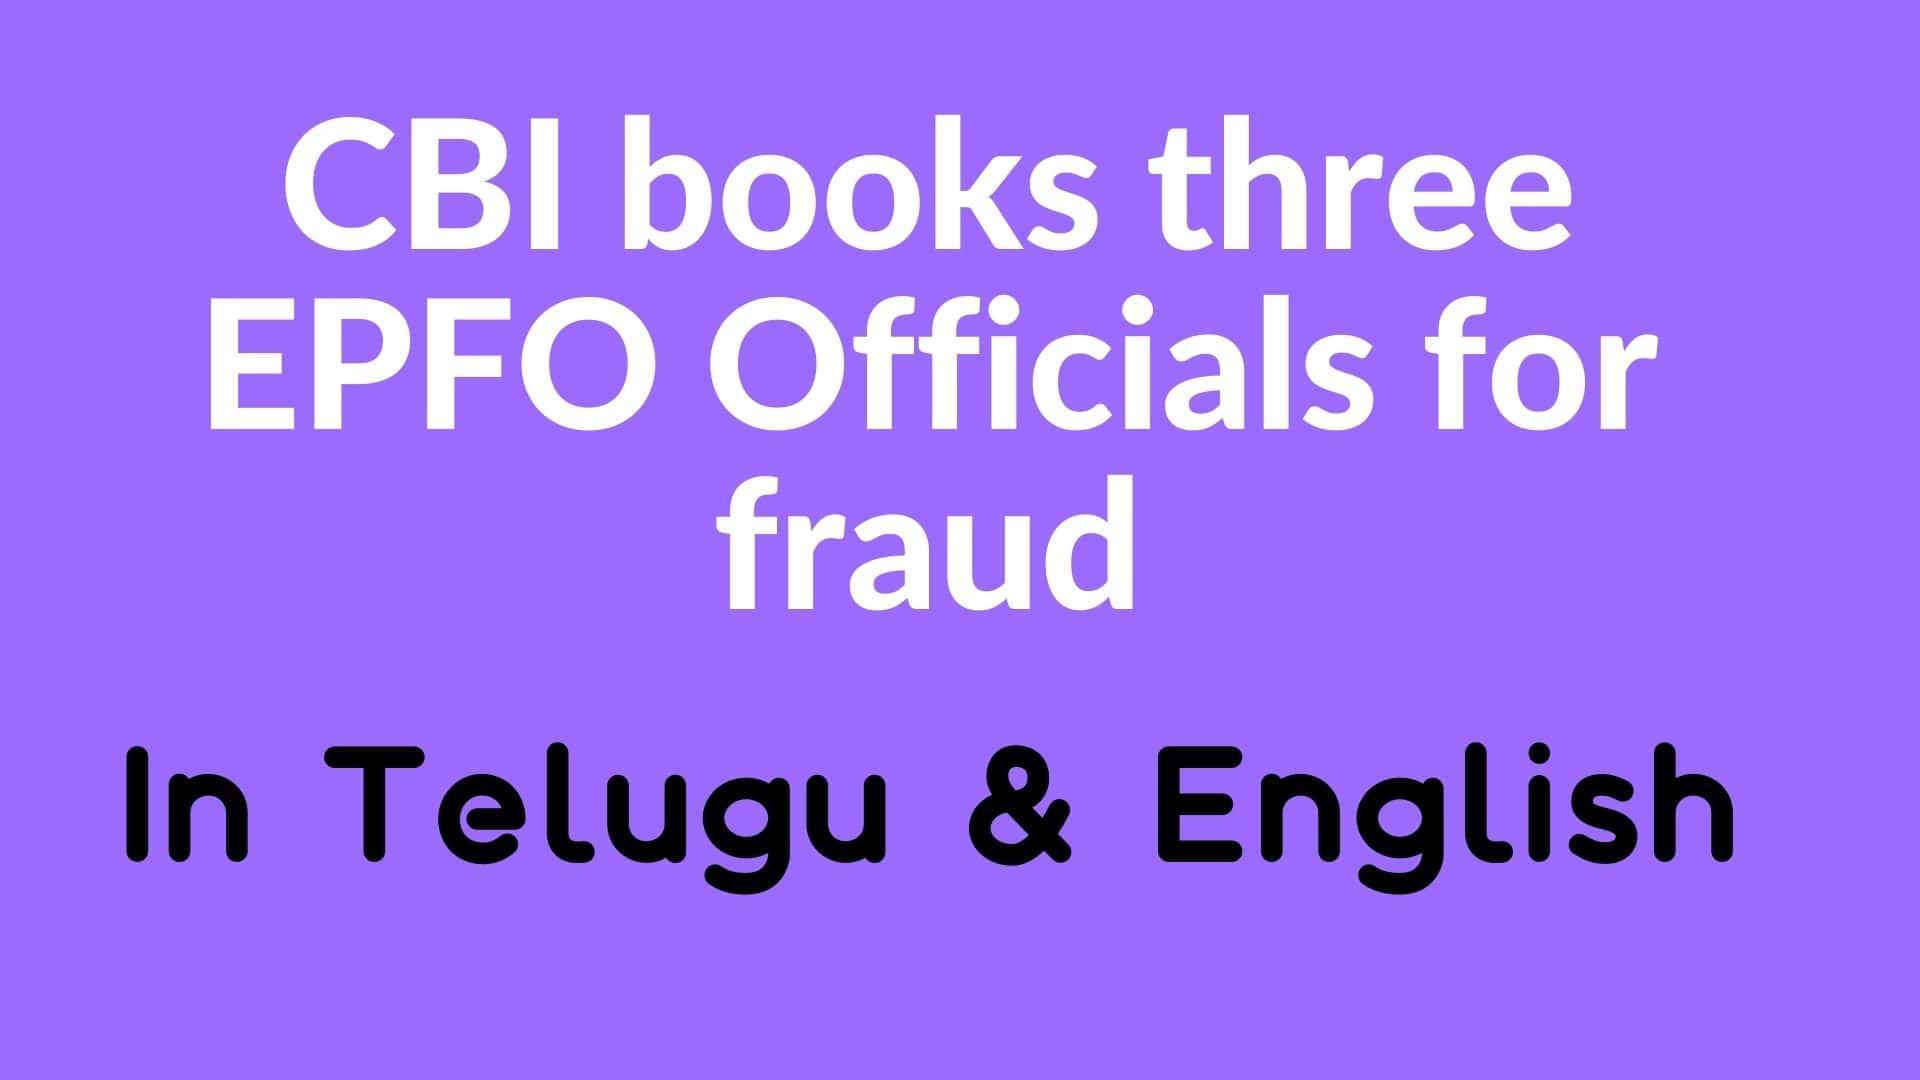 cbi books three epfo